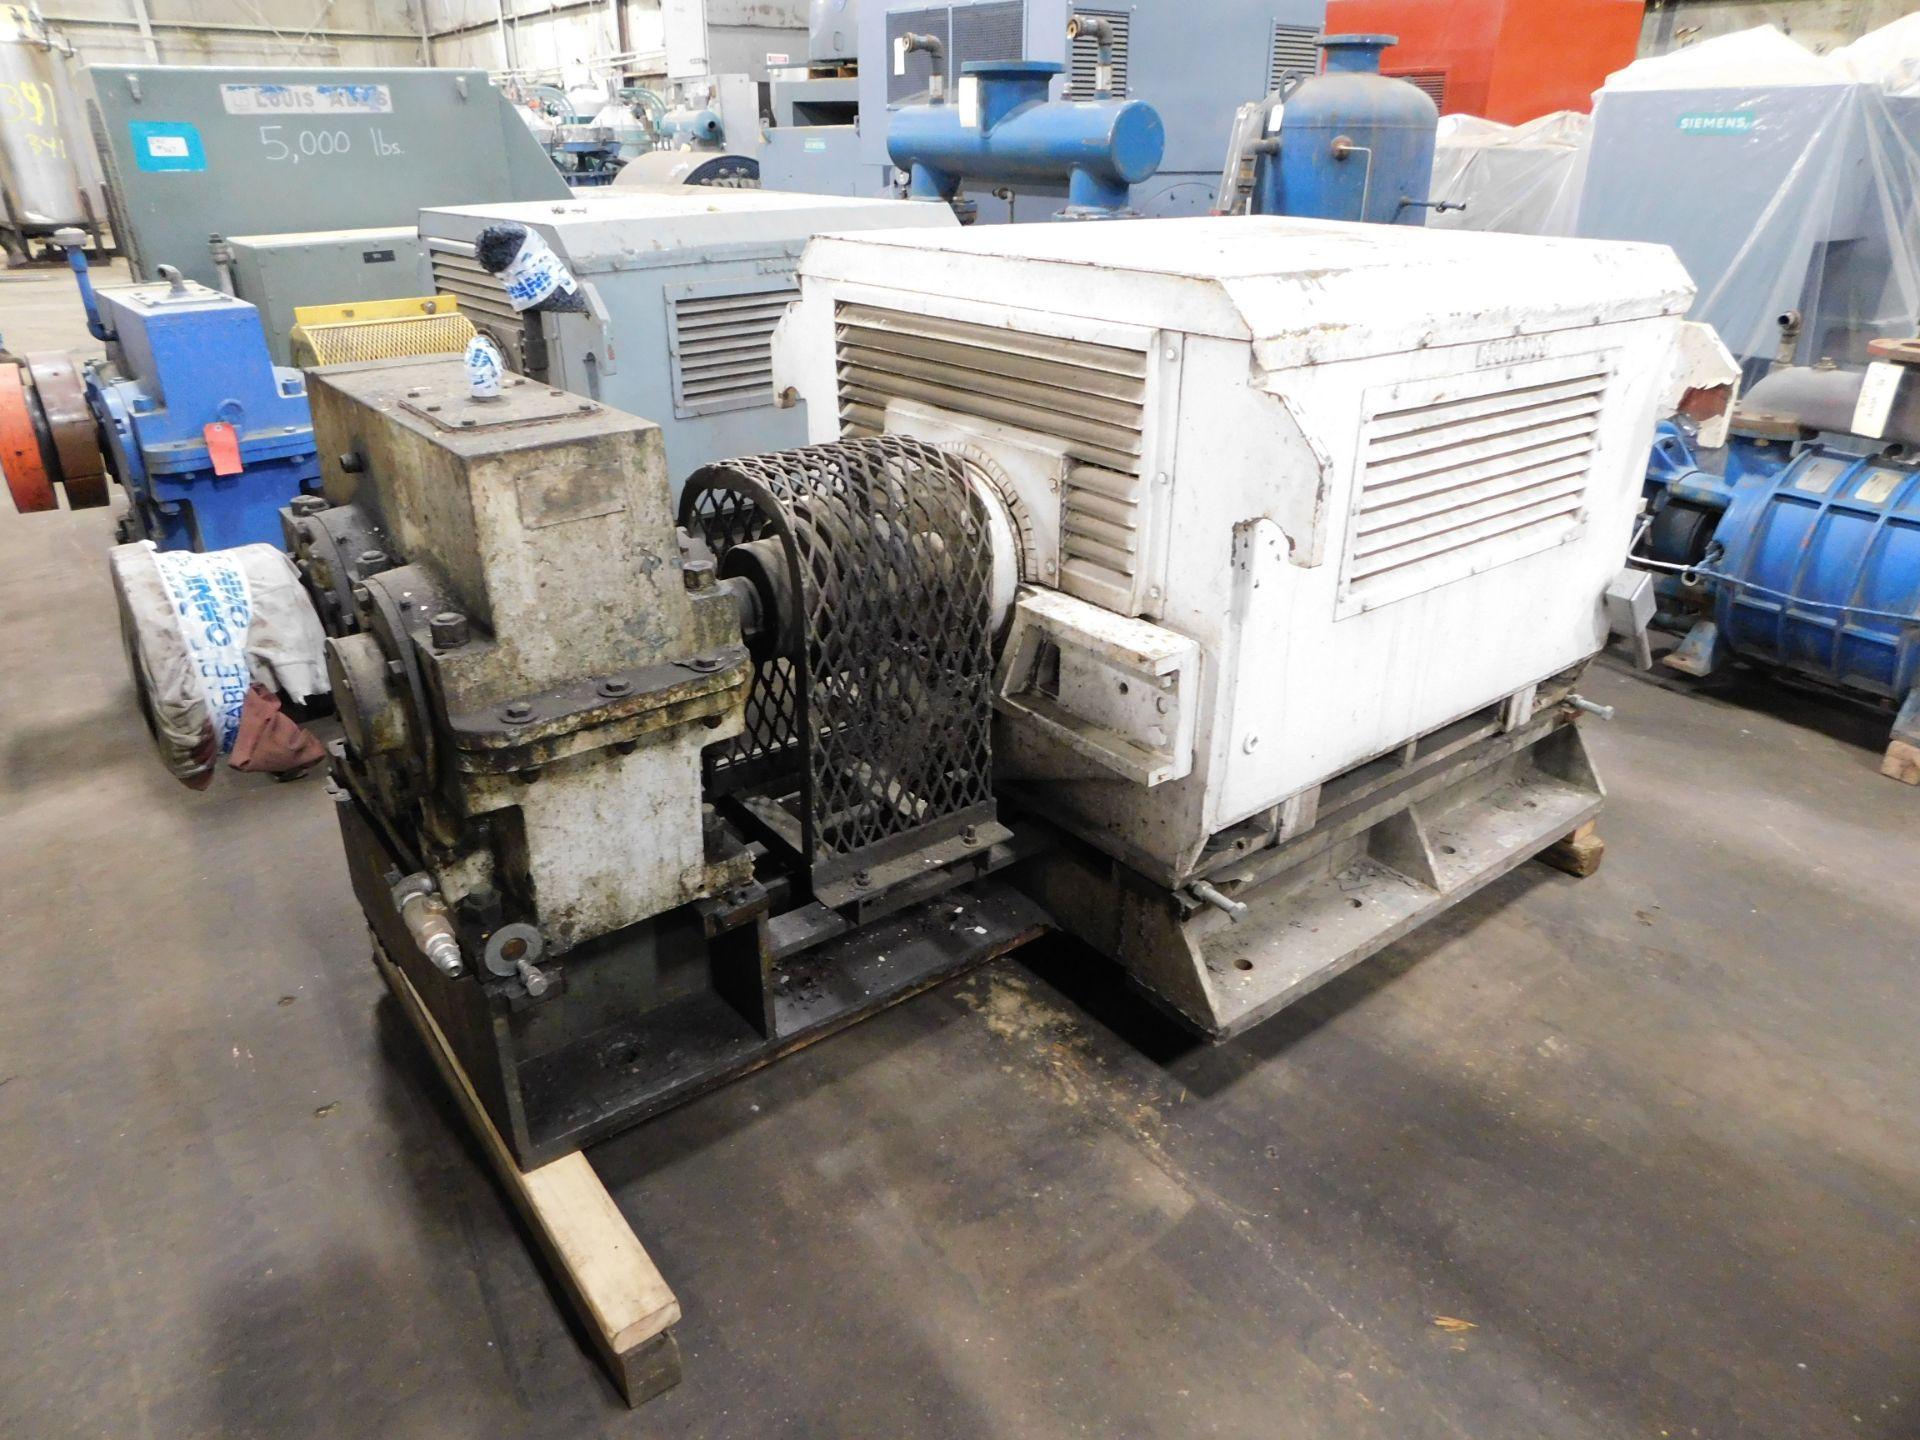 Reliance AC Duty Master Motor. 900 HP. 3 Ph. 60 Hz. 4160 V. 1789 RPM. 6809S. Type P. - Image 2 of 7